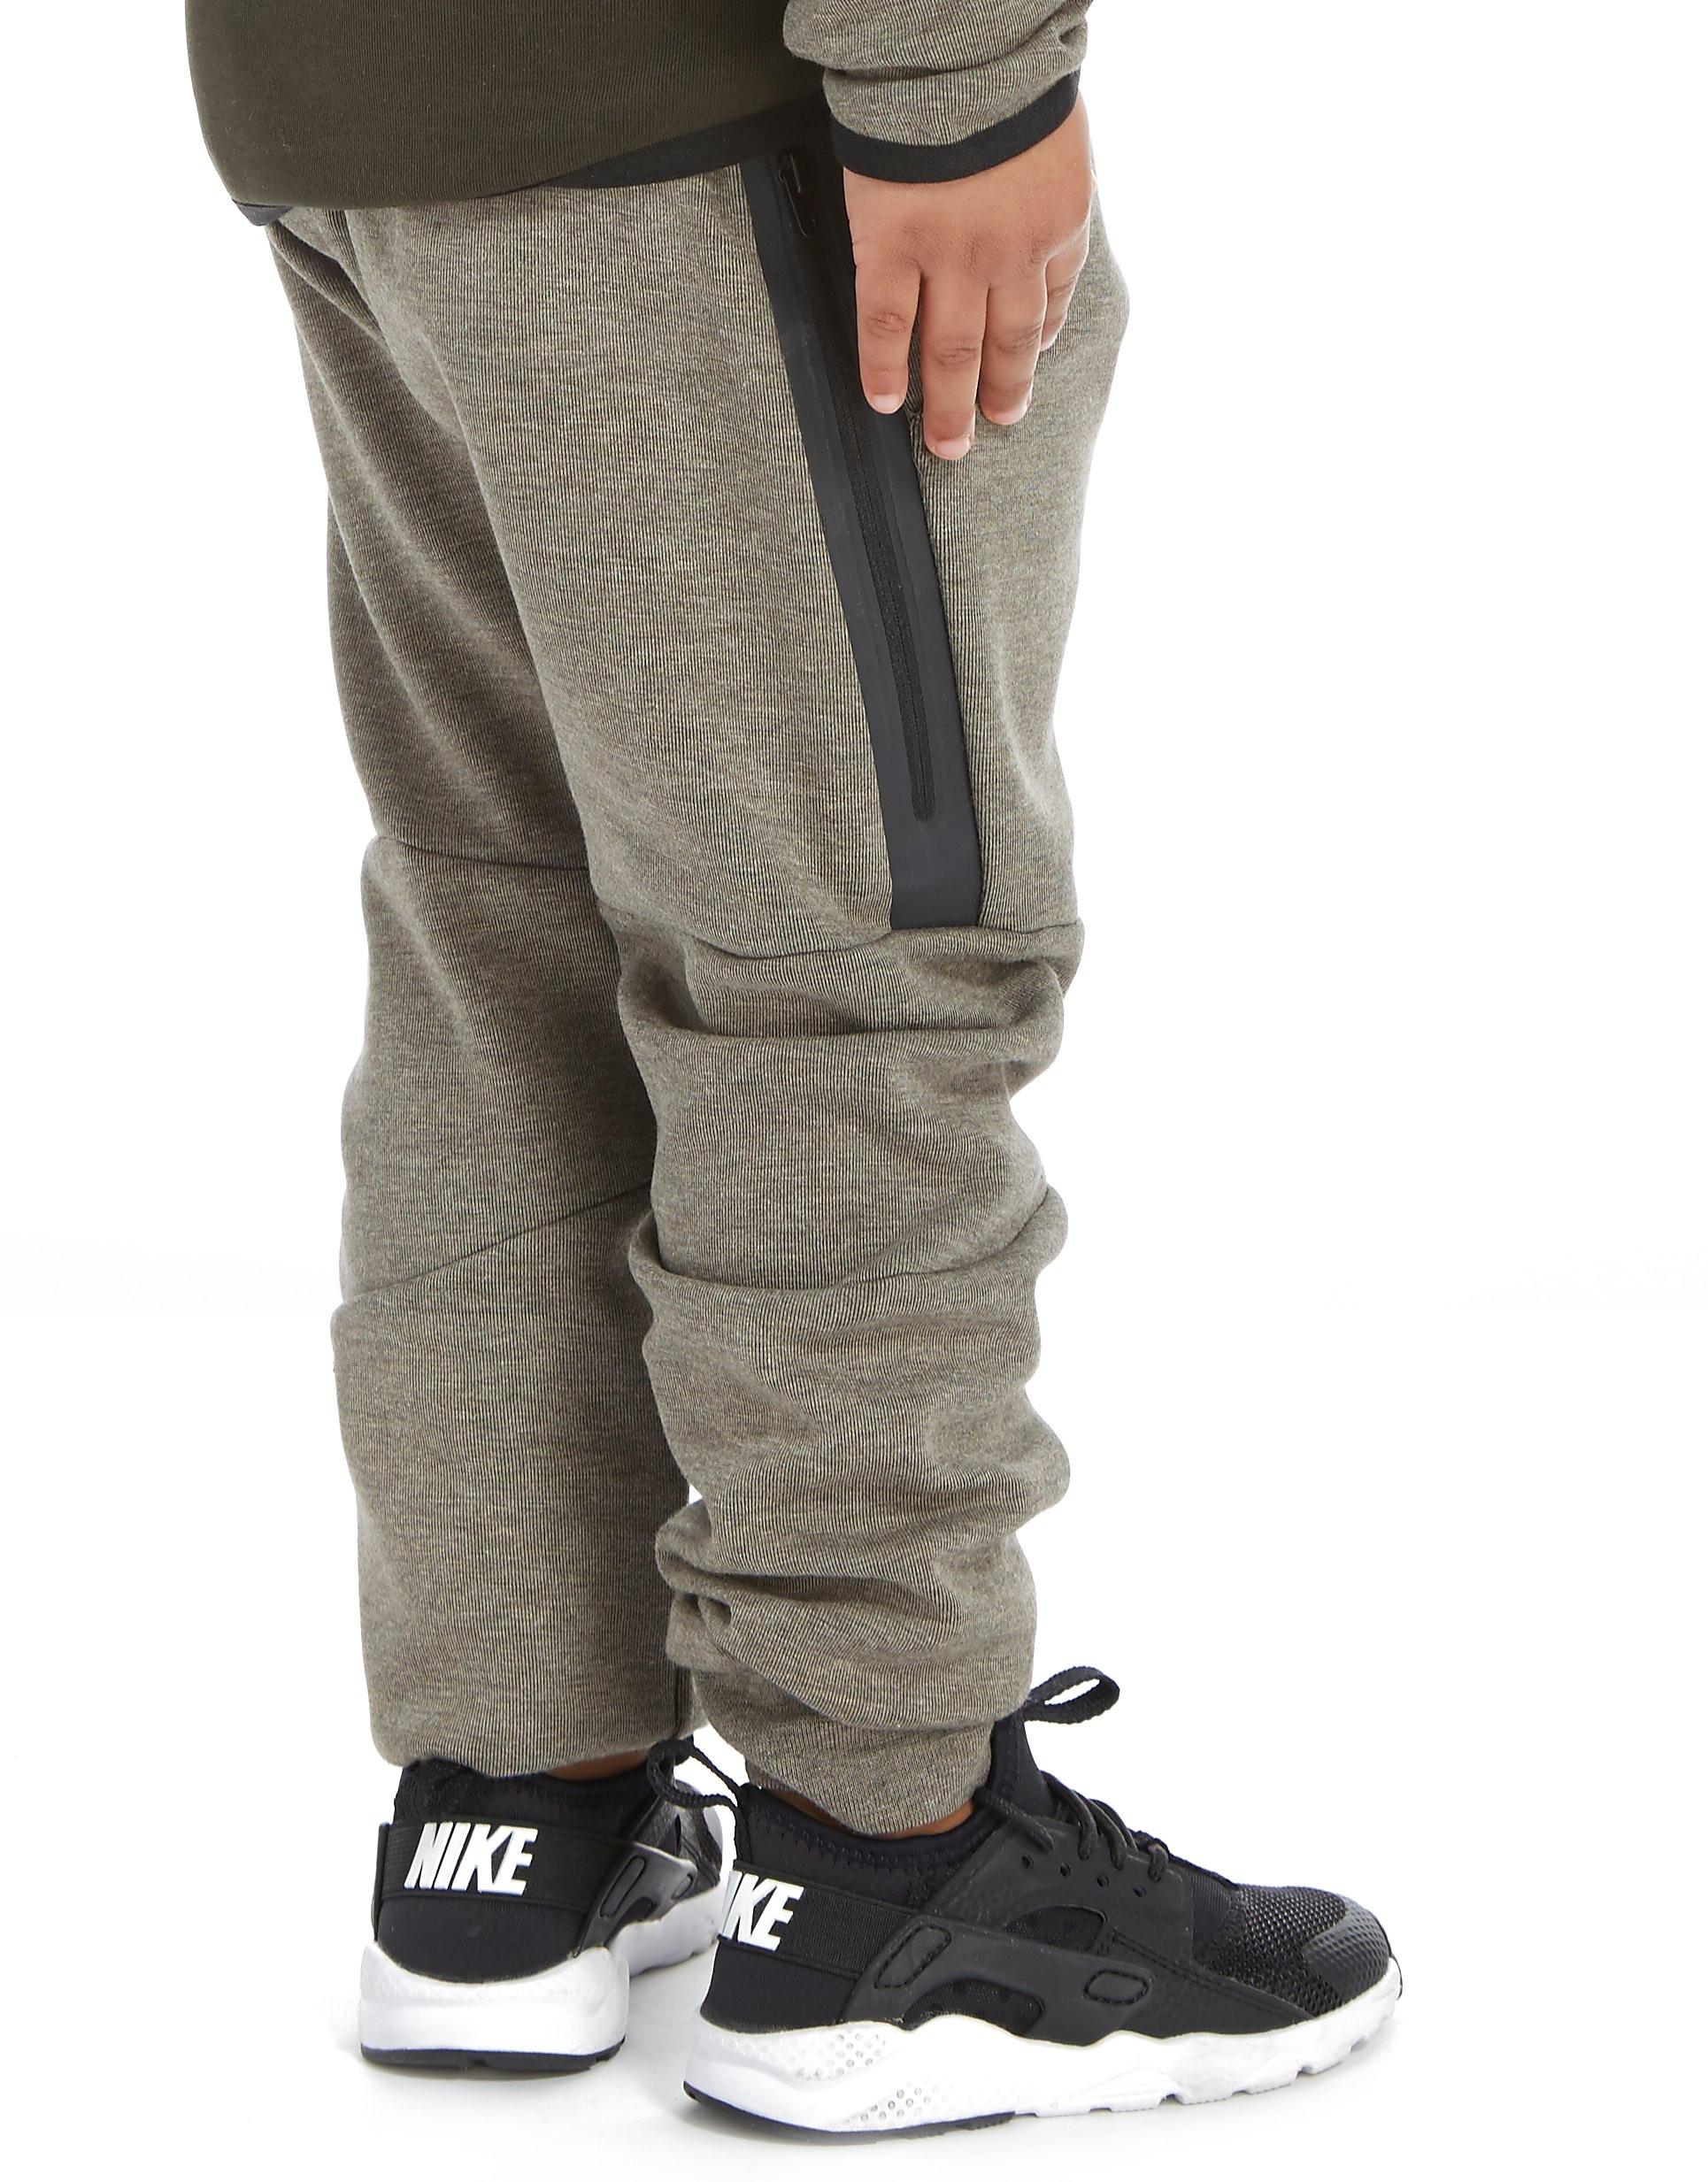 Nike Tech Fleece Pants Childrens